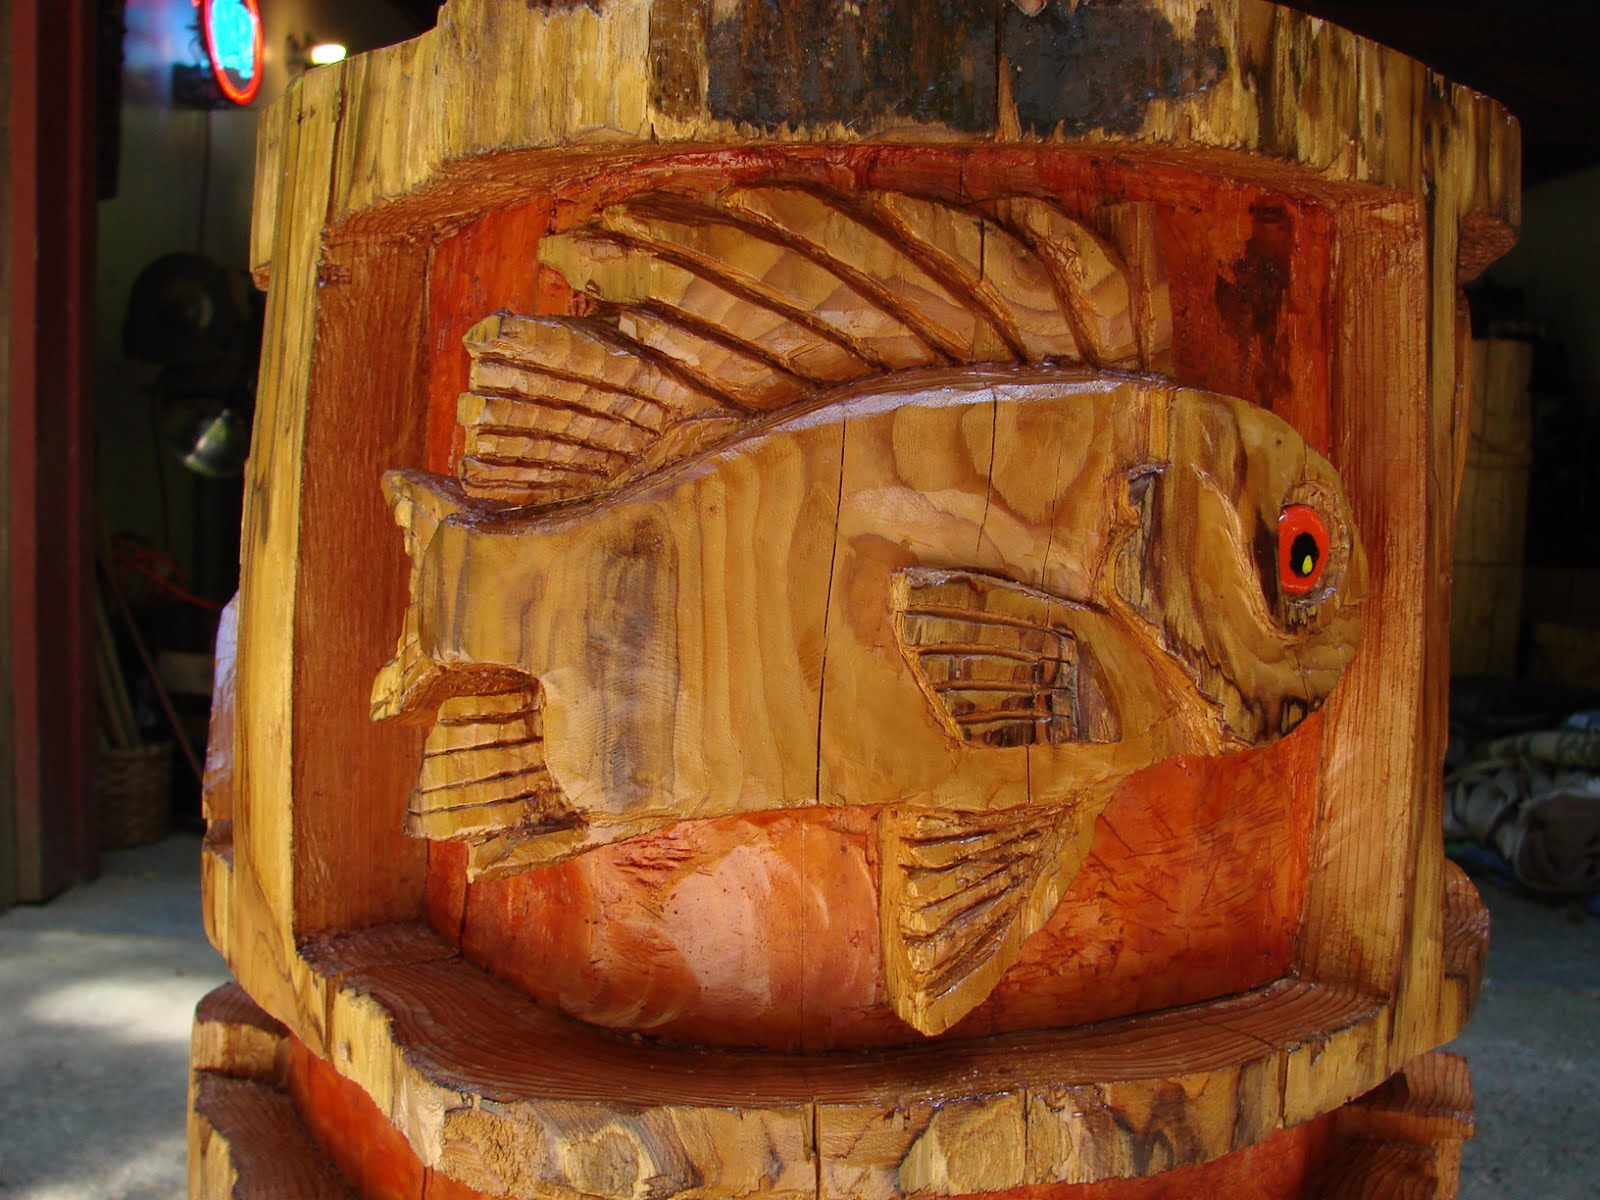 The Hawaiian fish I used is called an Alaihi.